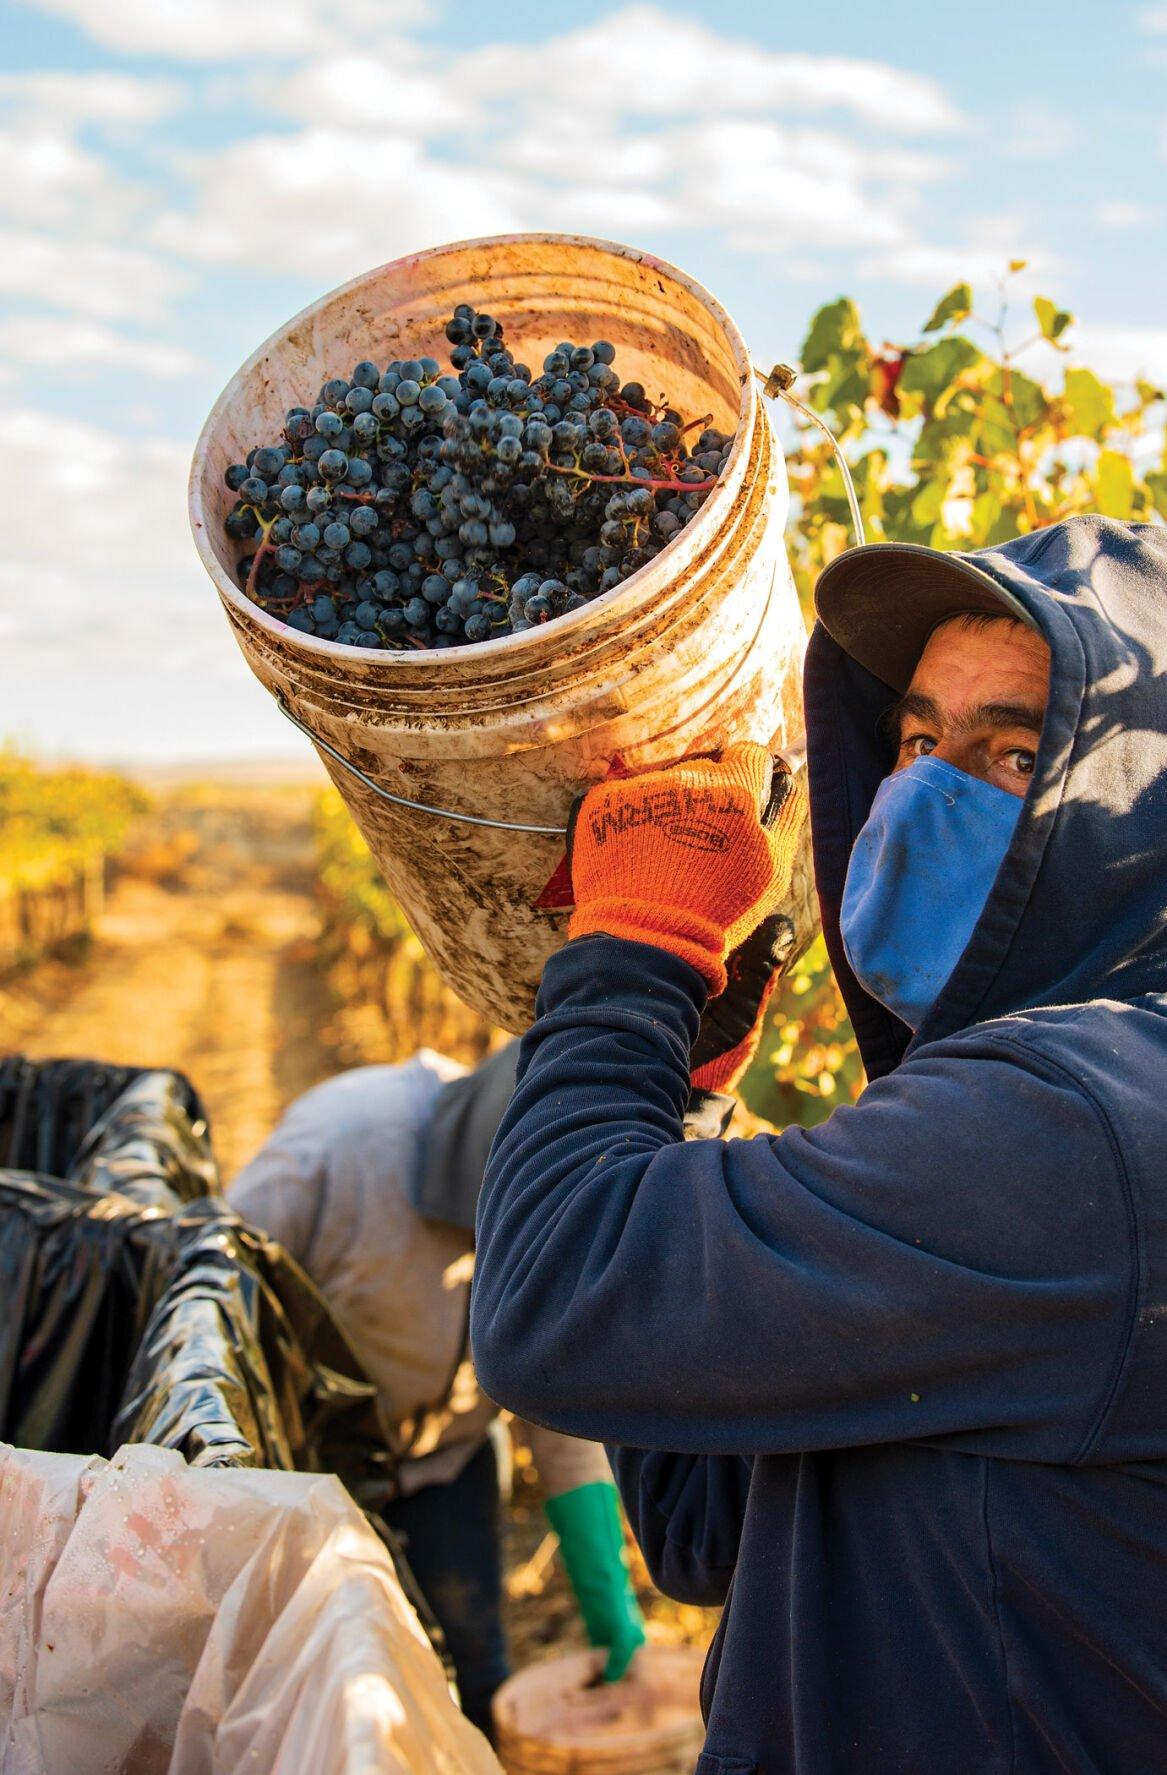 10_28_Airfield Estate Winery_Hand Harvest_Bucket_COPY_PWS2821.jpg